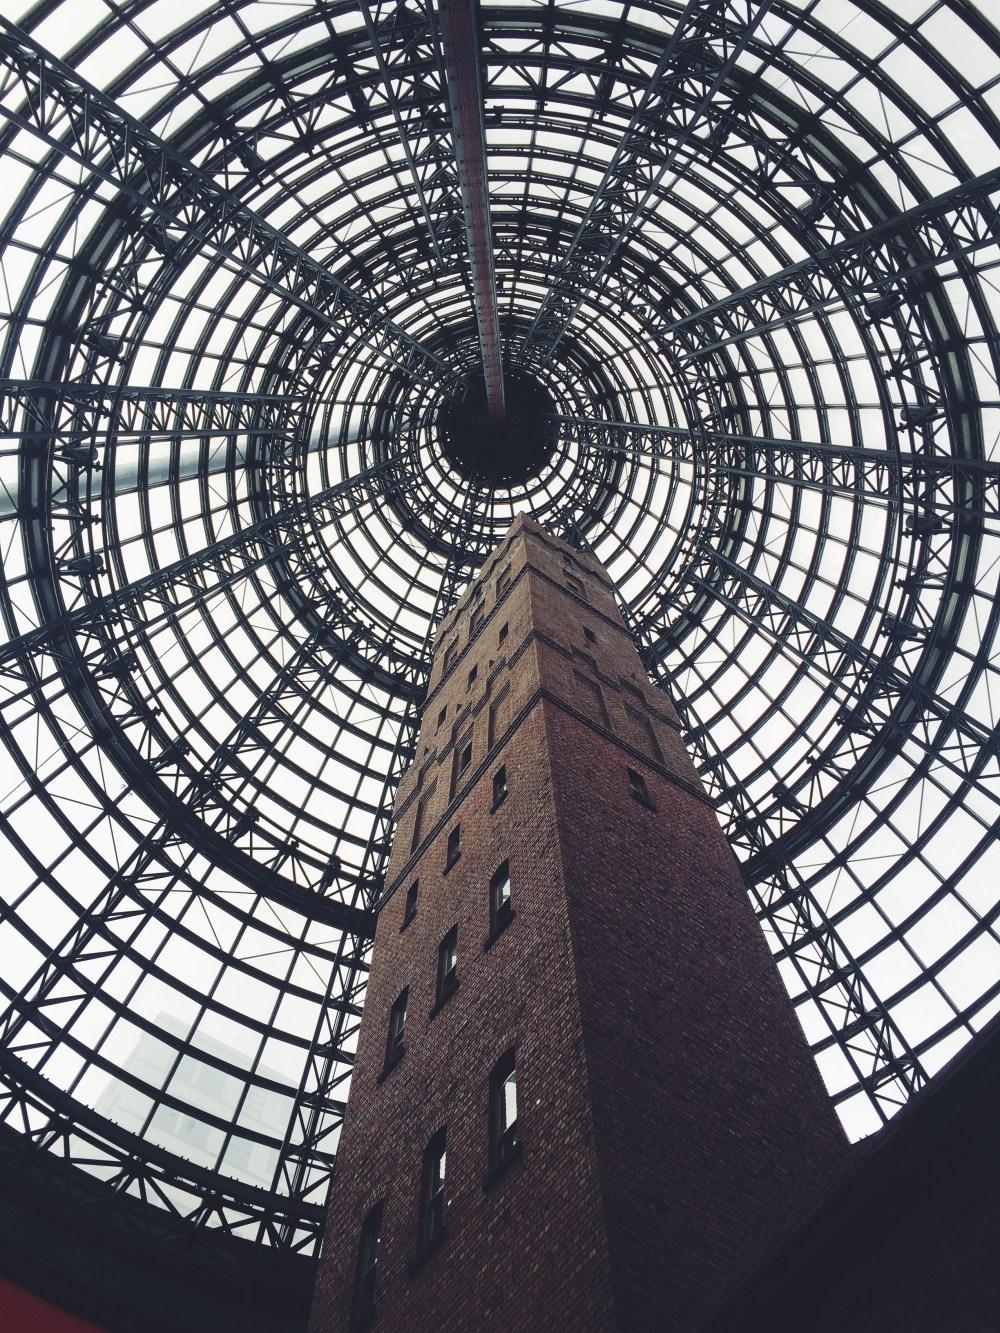 1 July 2016: Coop's Shot Tower | Melbourne CBD, Victoria